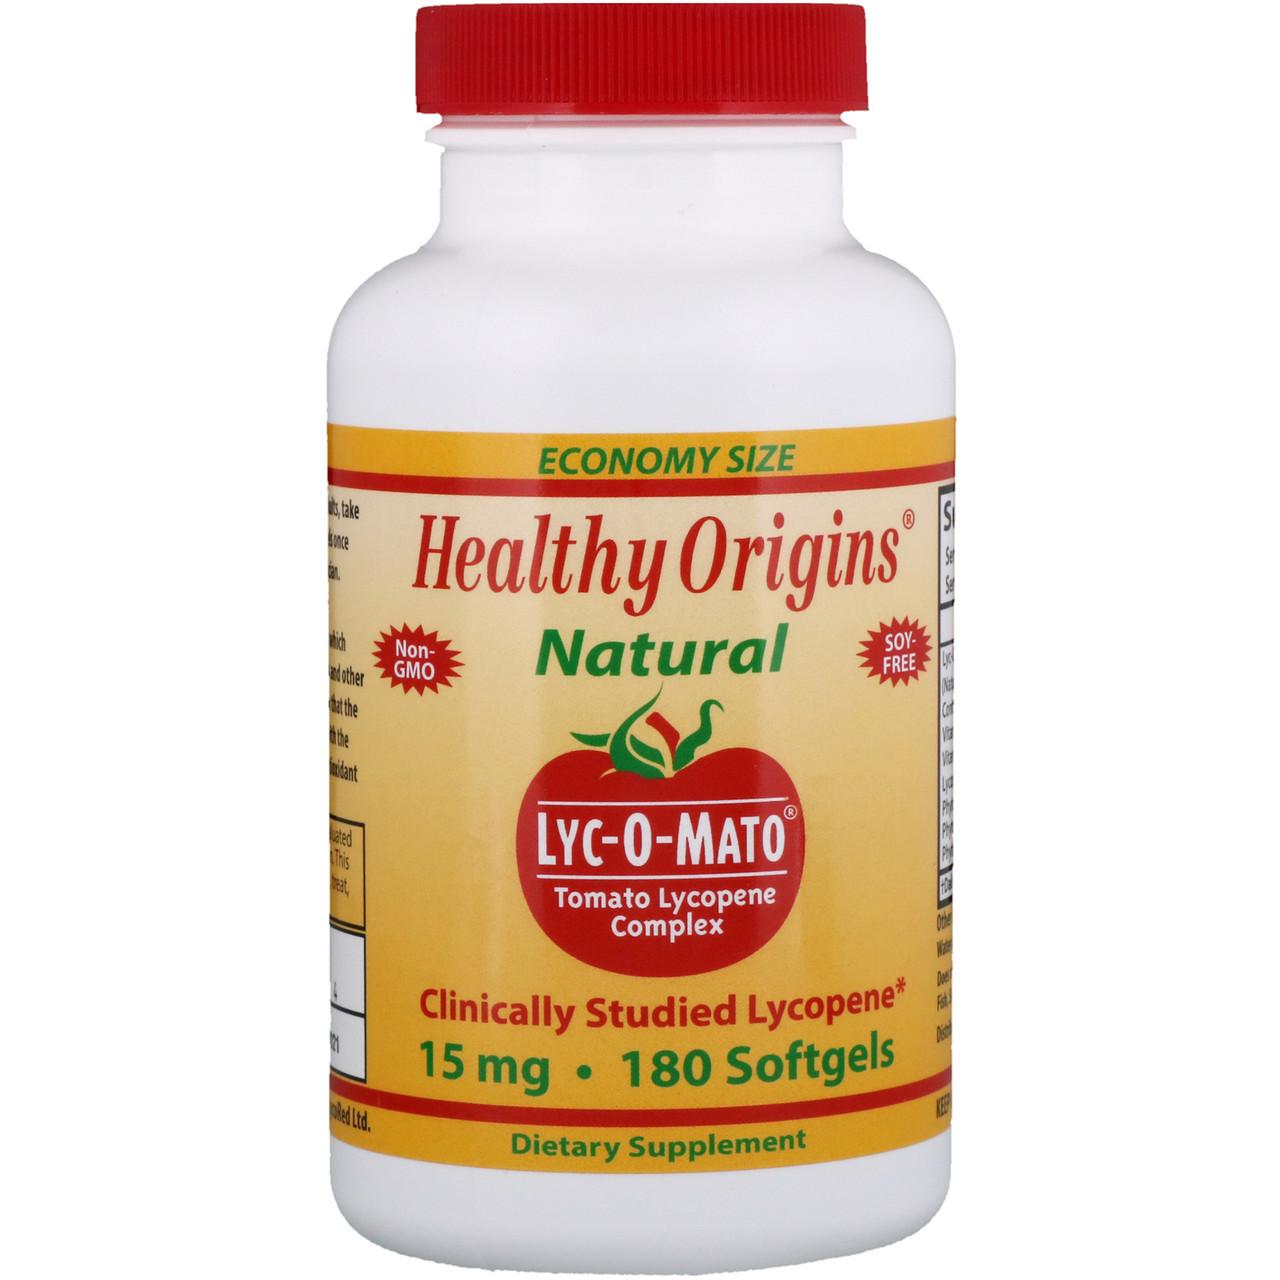 Ликопин (Lyc-O-Mato, Tomato Lycopene), Healthy Origins, Комплекс, 15 мг, 180 капсул